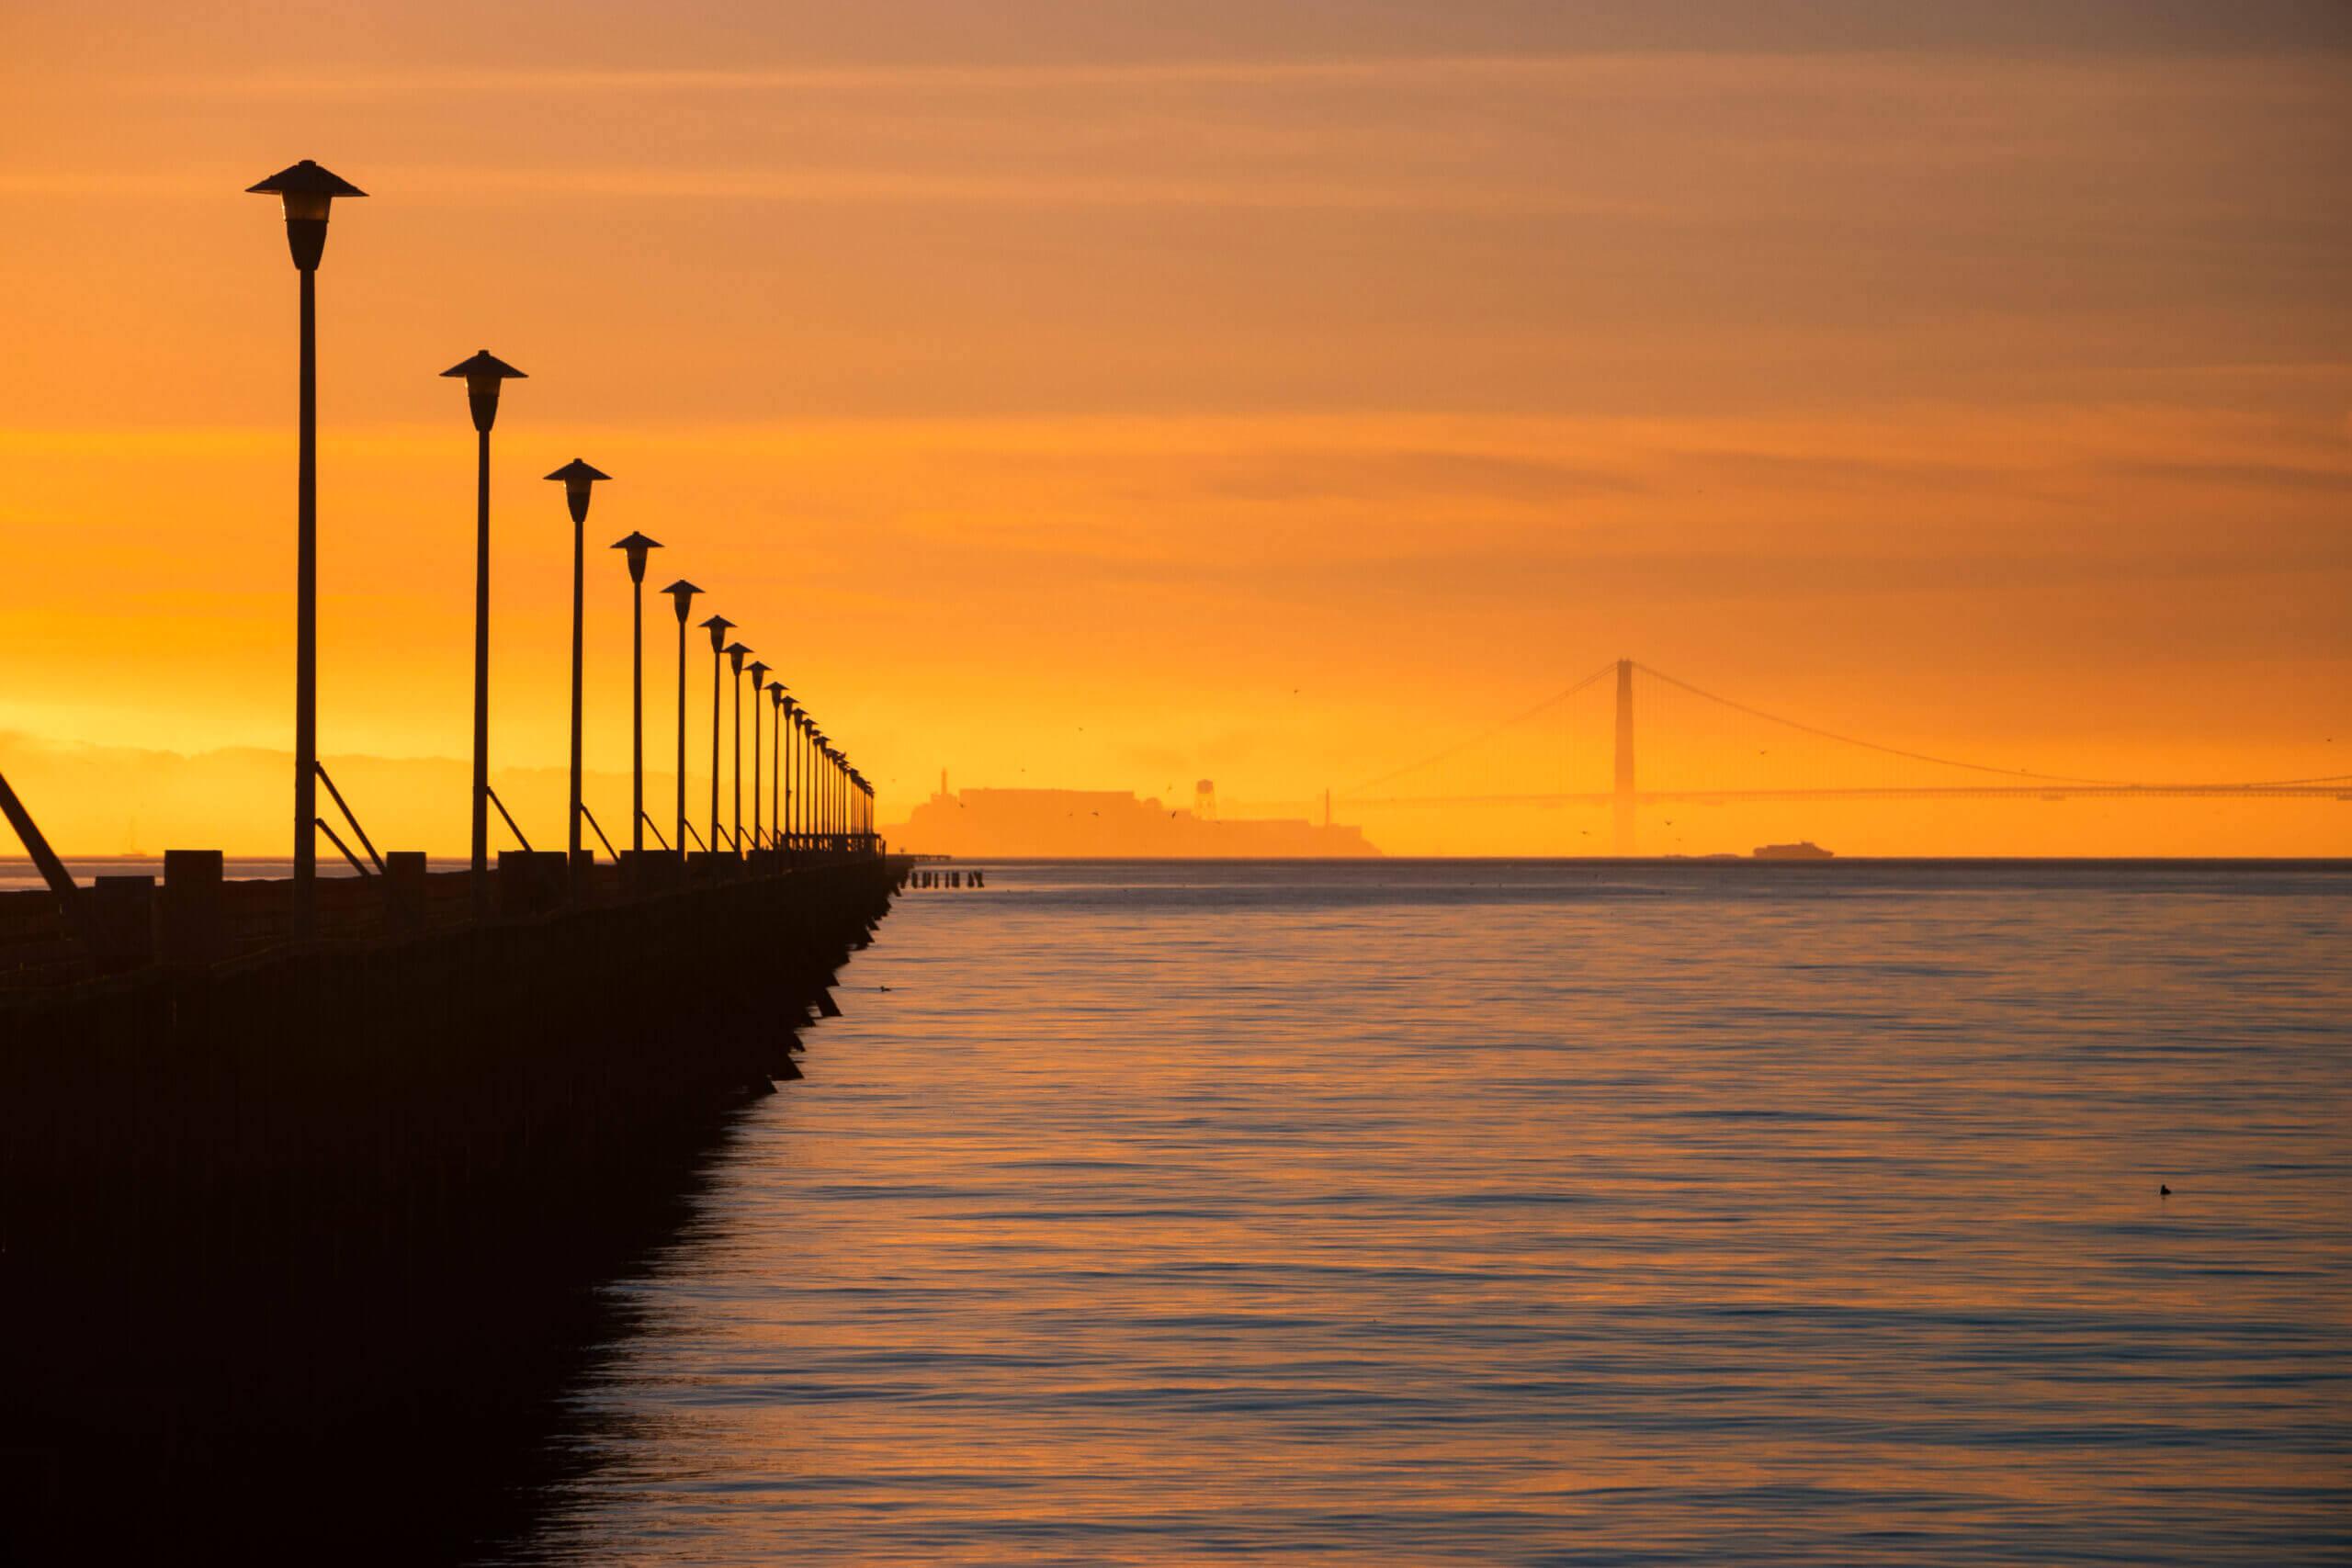 Canva - Silhouette of Bridge during Sunset (1)